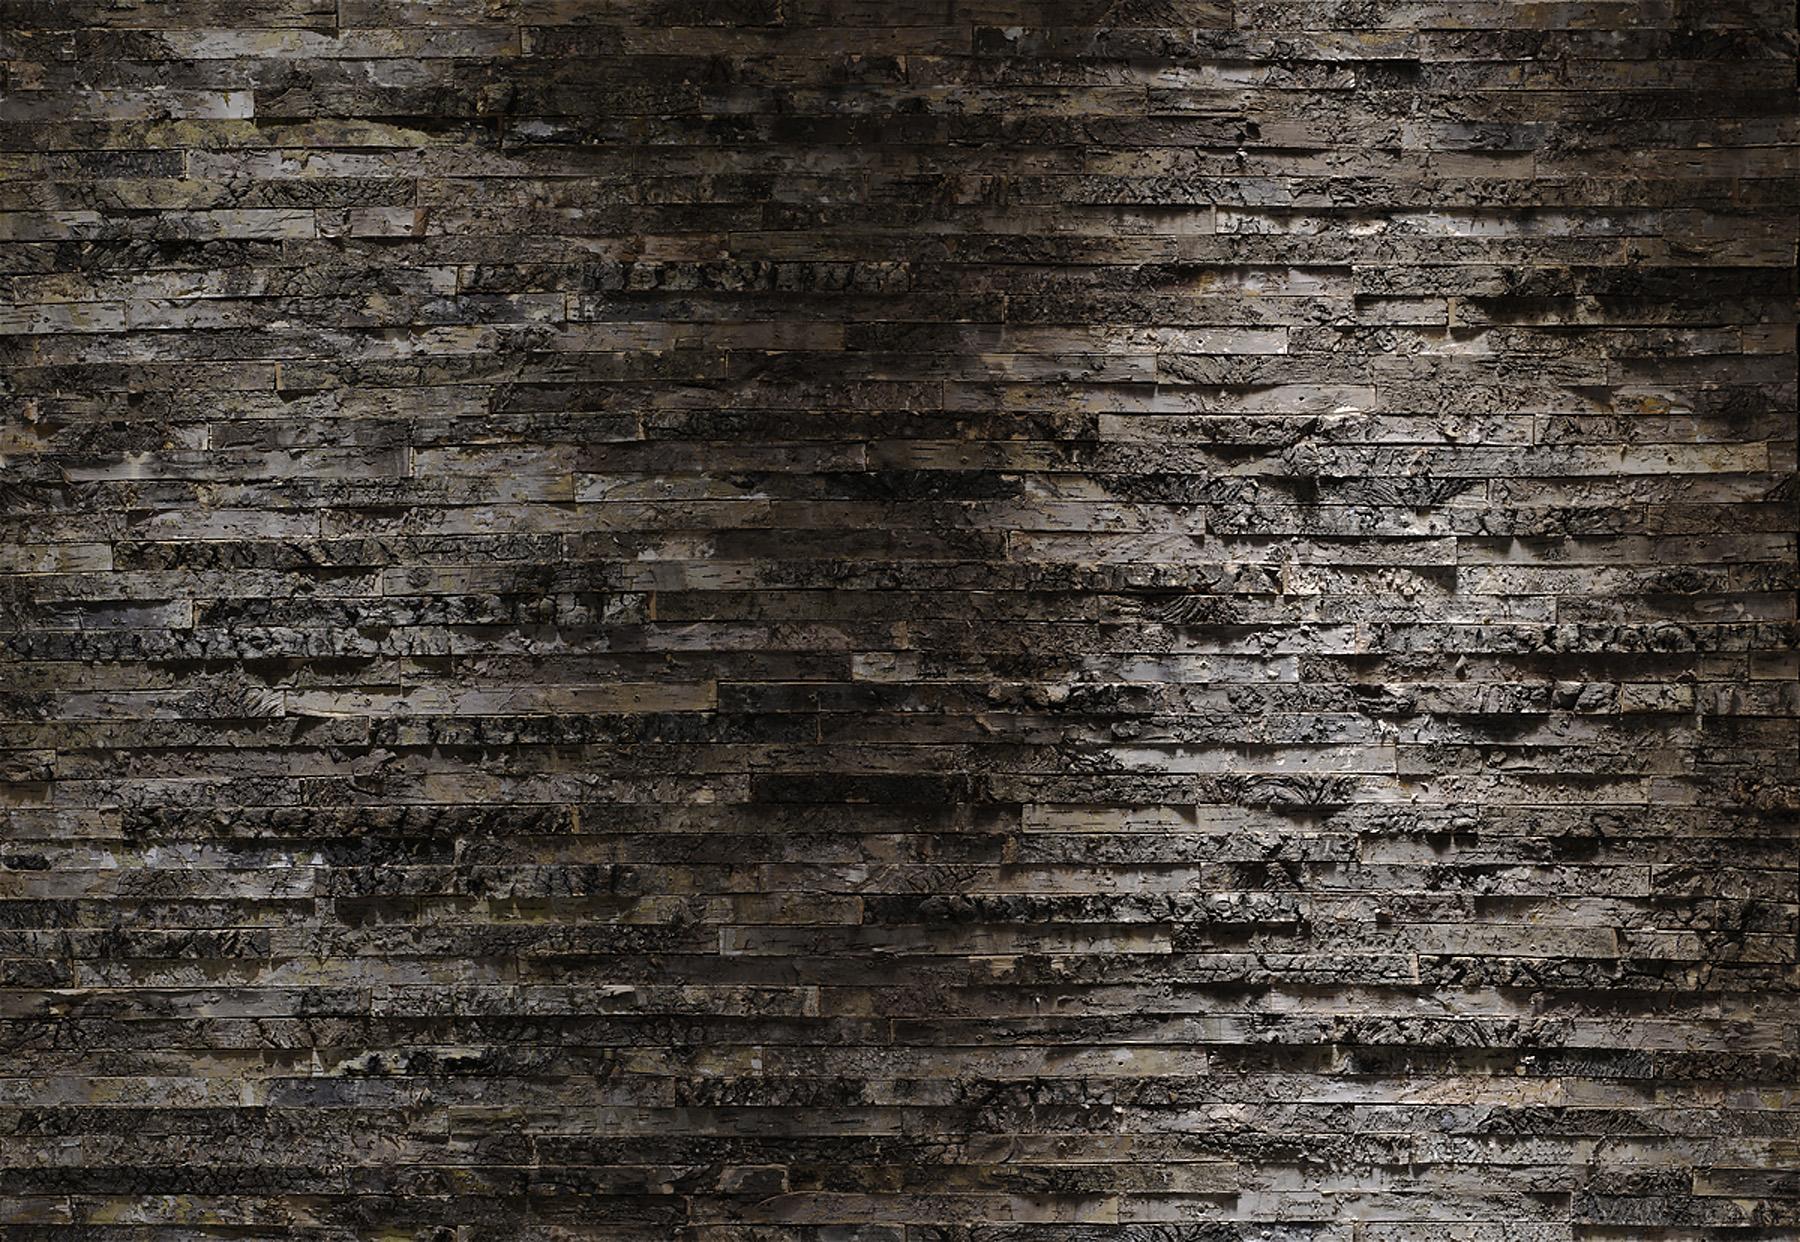 Birkenrinde Wall Mural 8 700 By Komar